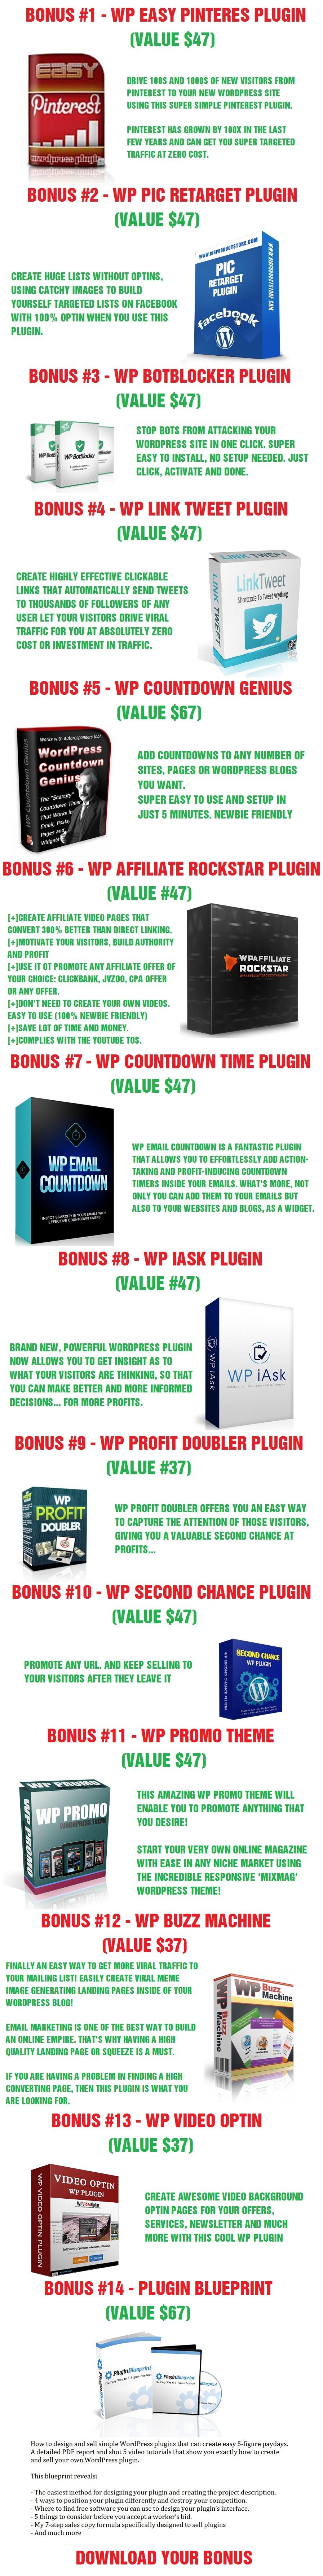 WP Master Clone Bonus